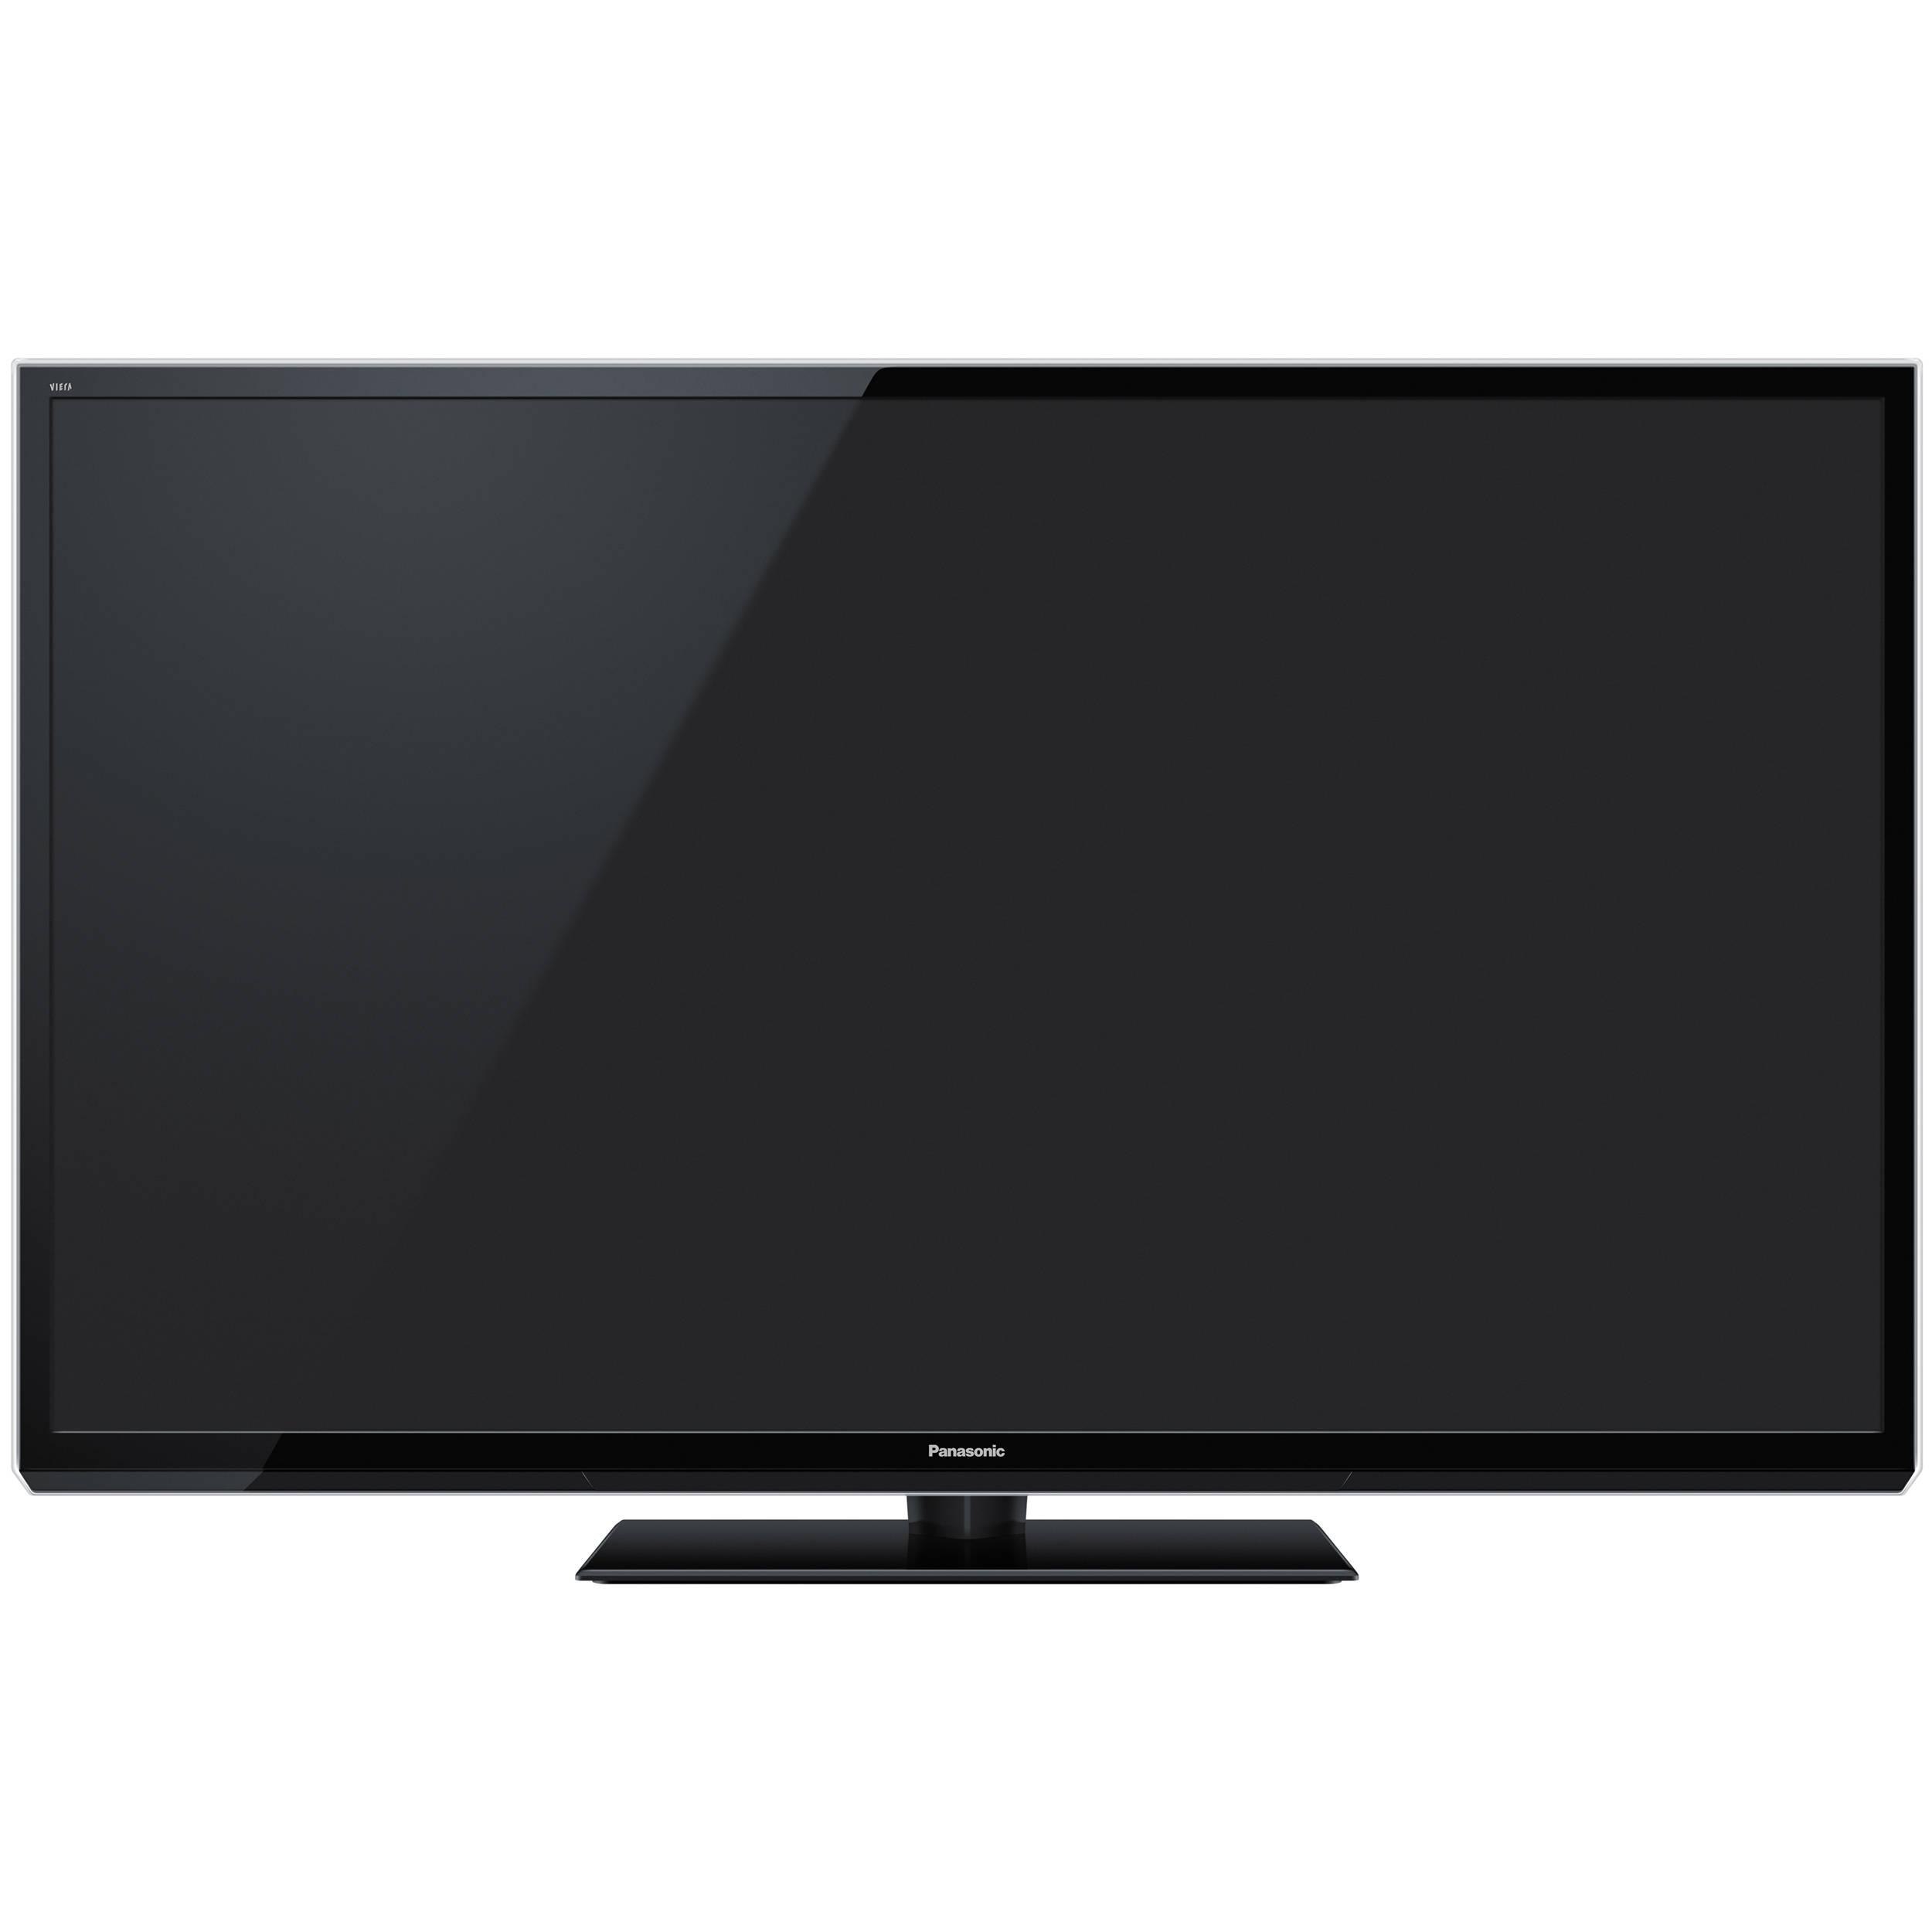 Panasonic TC-P60GT50 HDTV Drivers Download (2019)